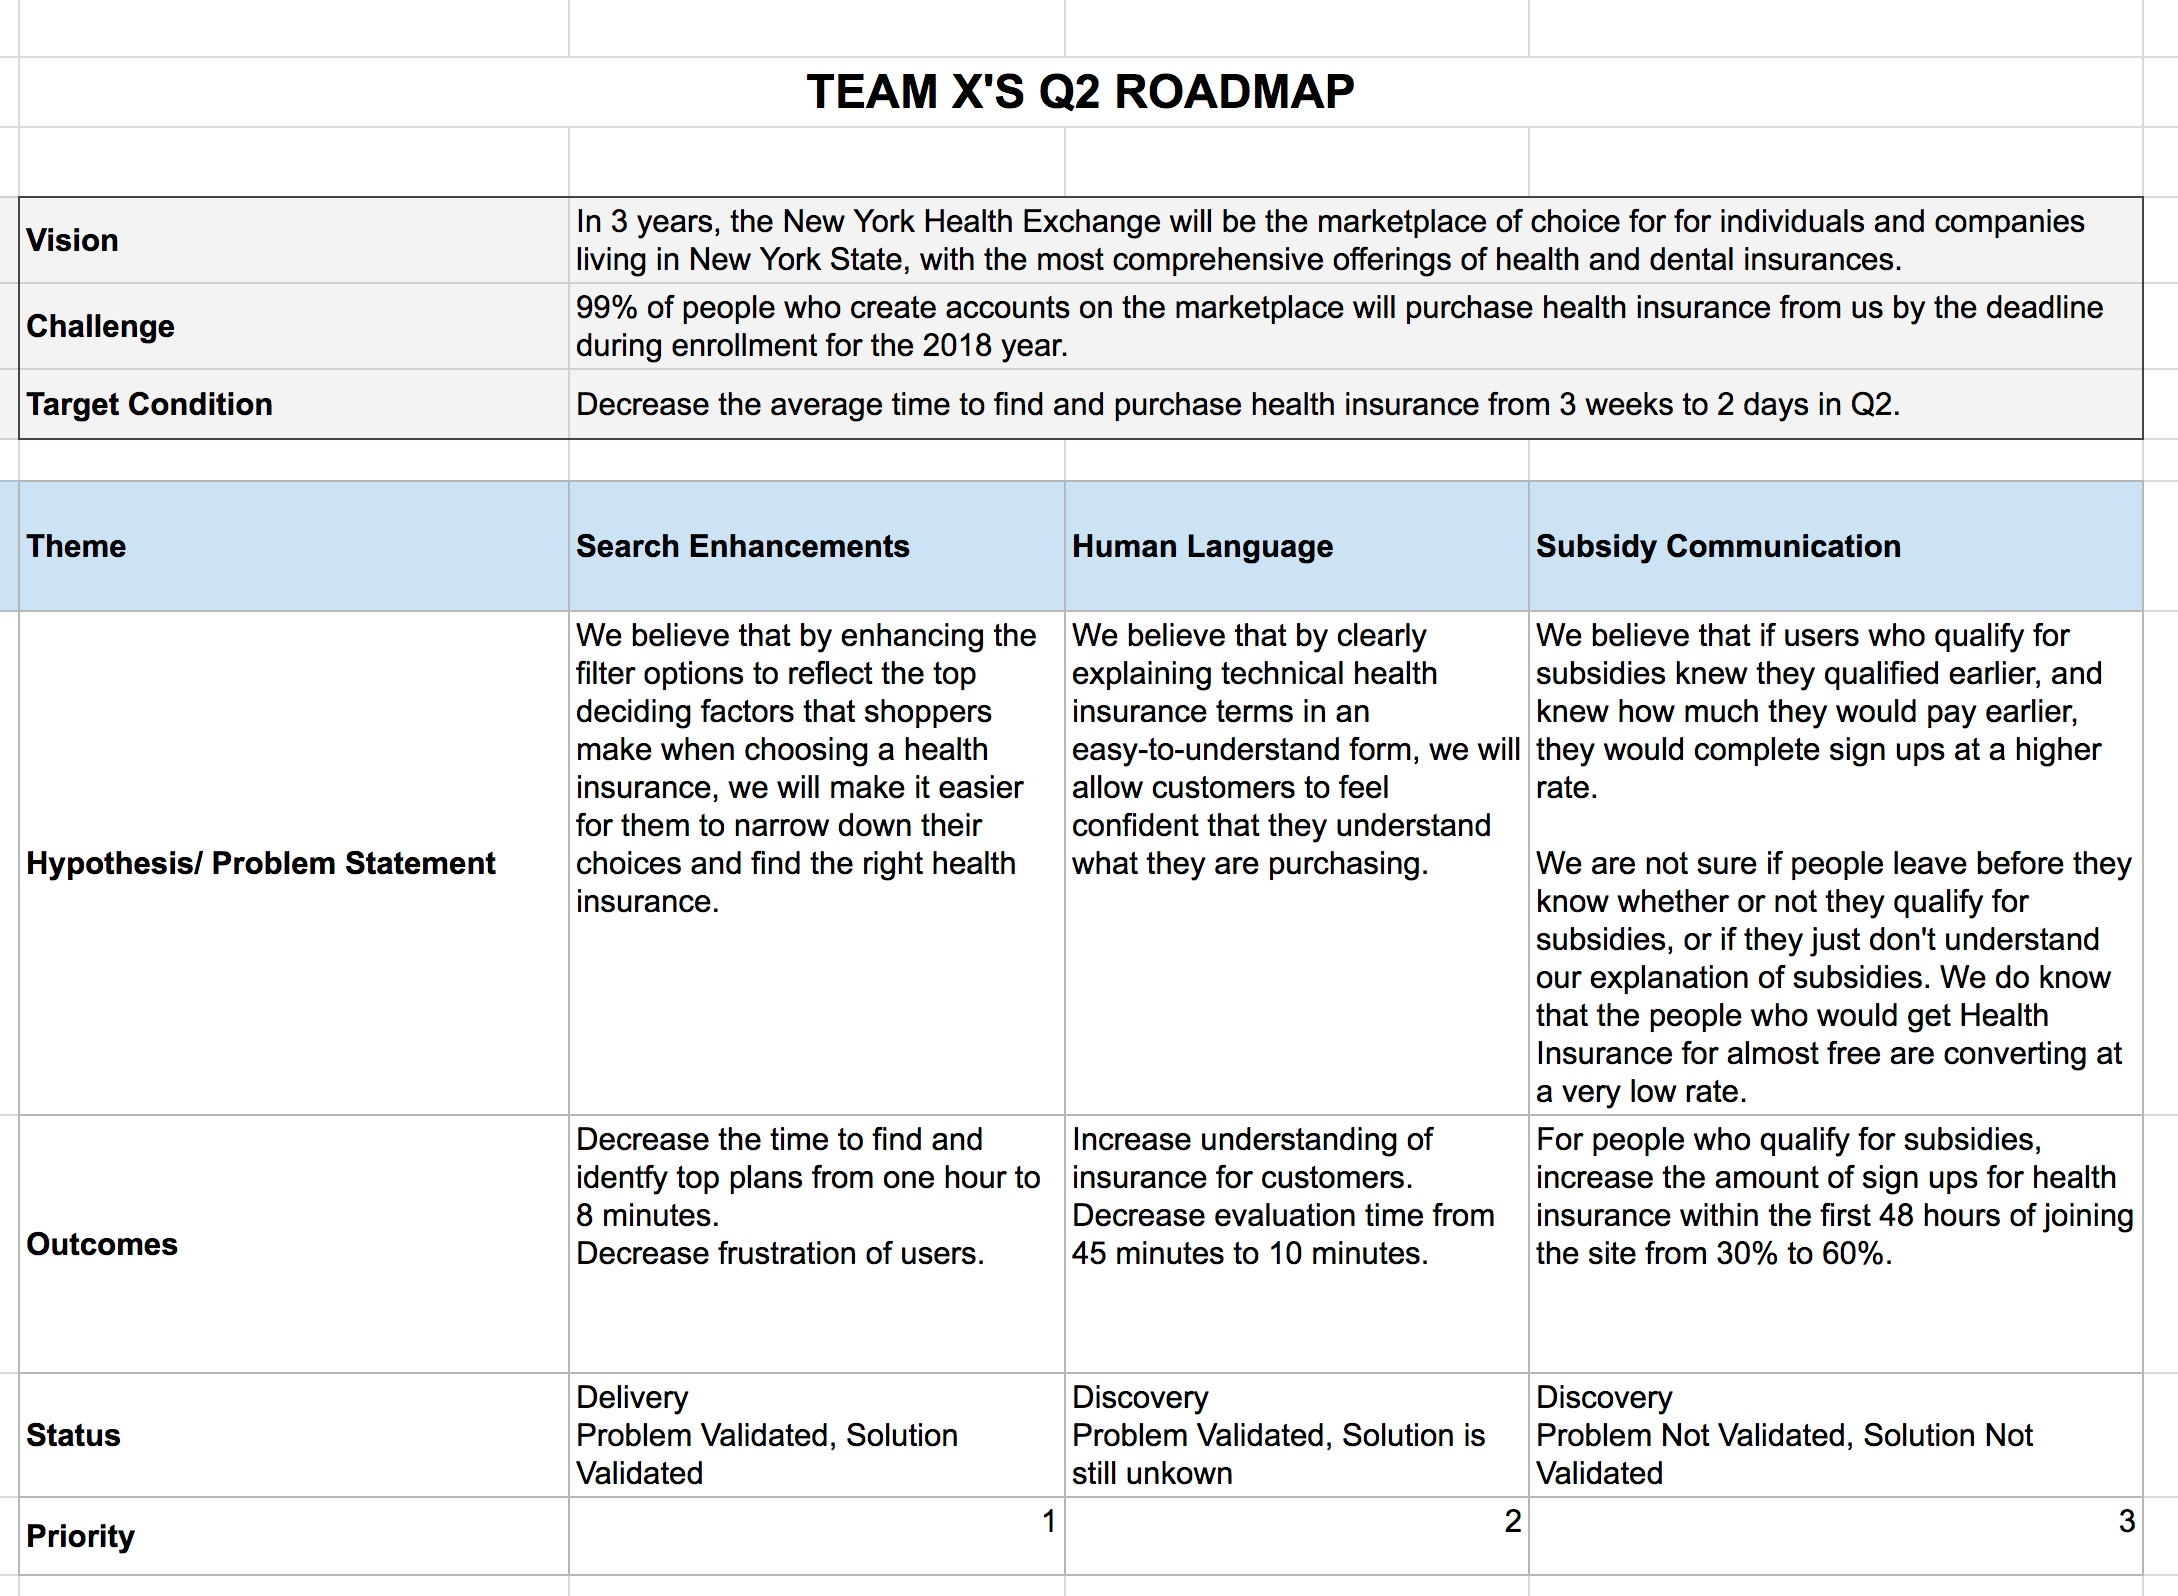 Example_Product_Roadmap_-_Google_Sheets.jpg